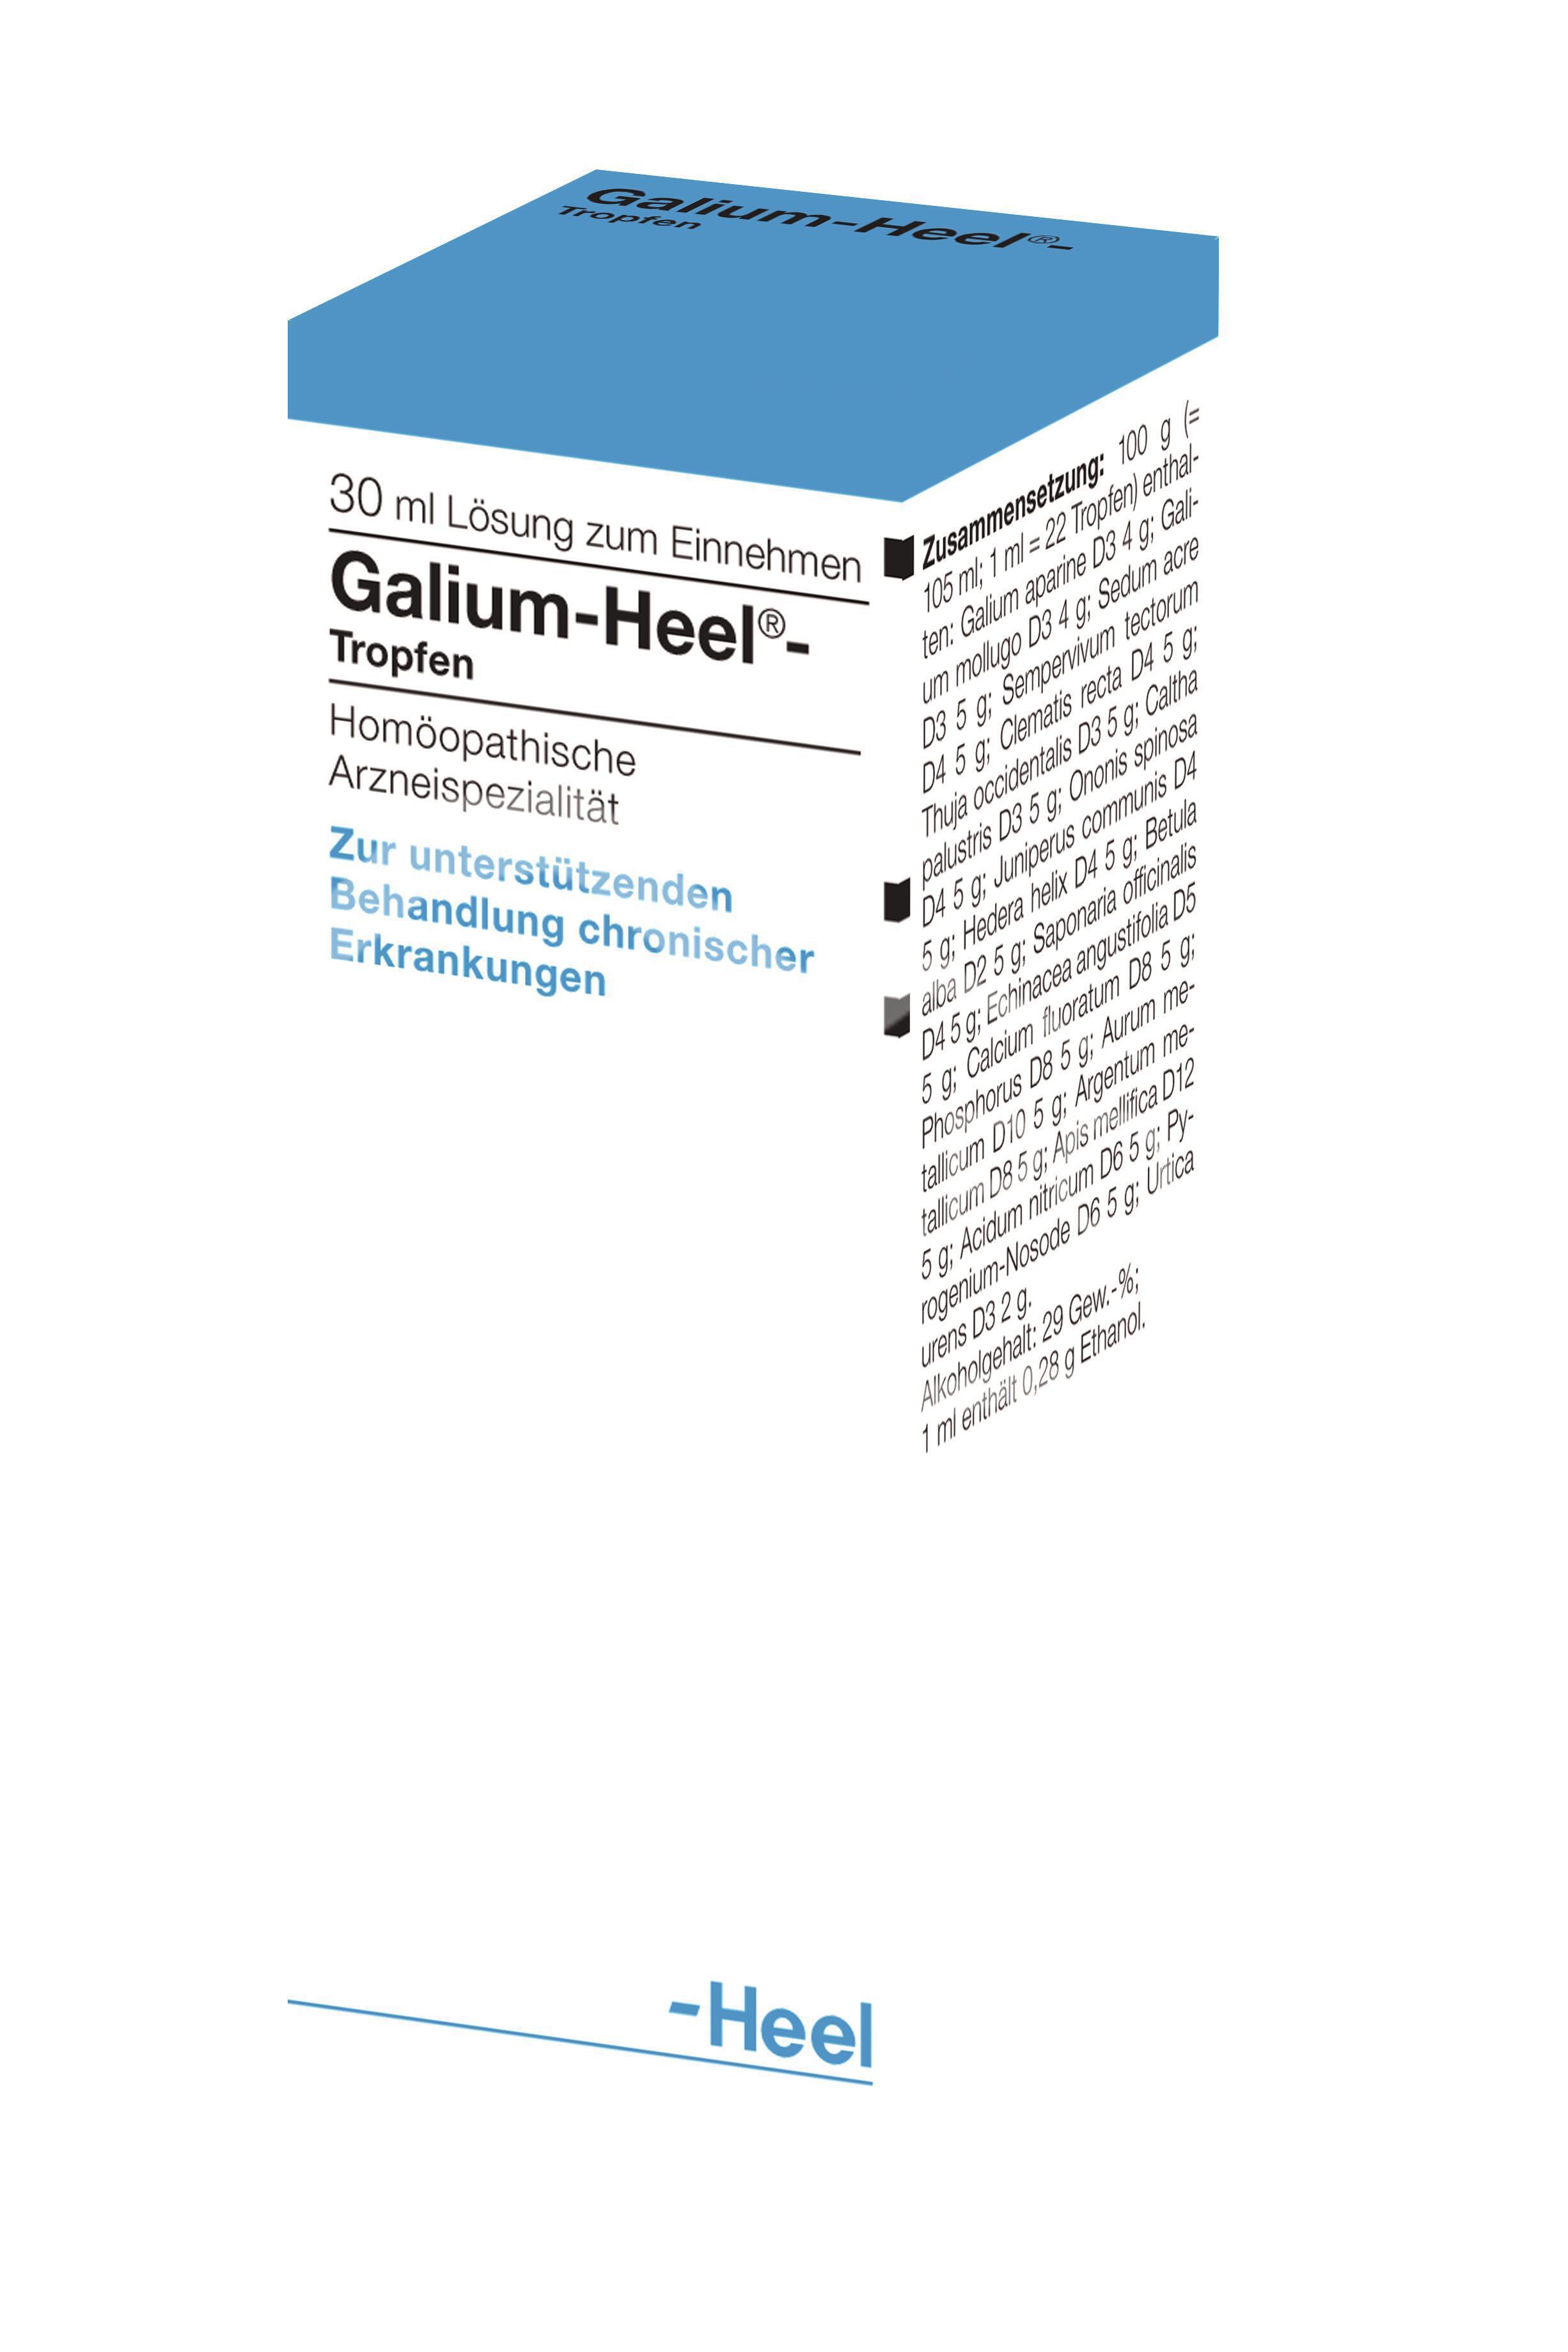 Galium-Heel®